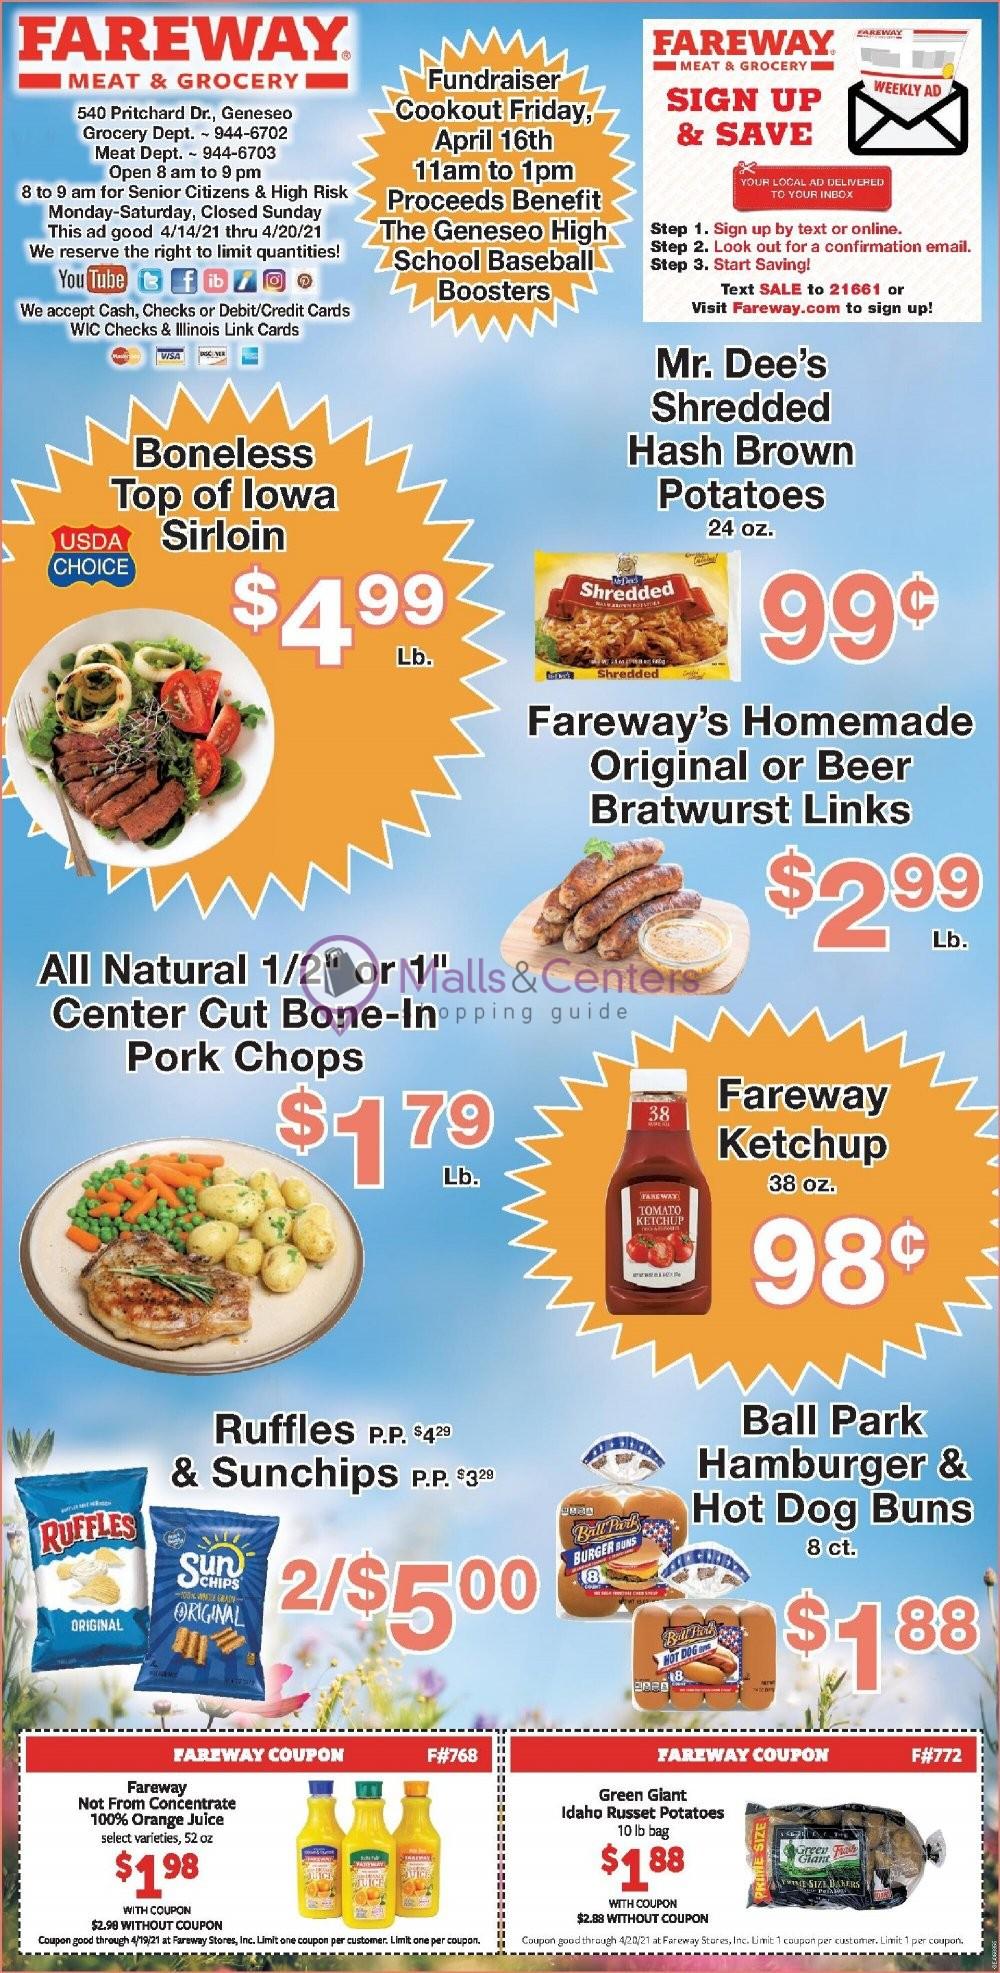 weekly ads Fareway - page 1 - mallscenters.com